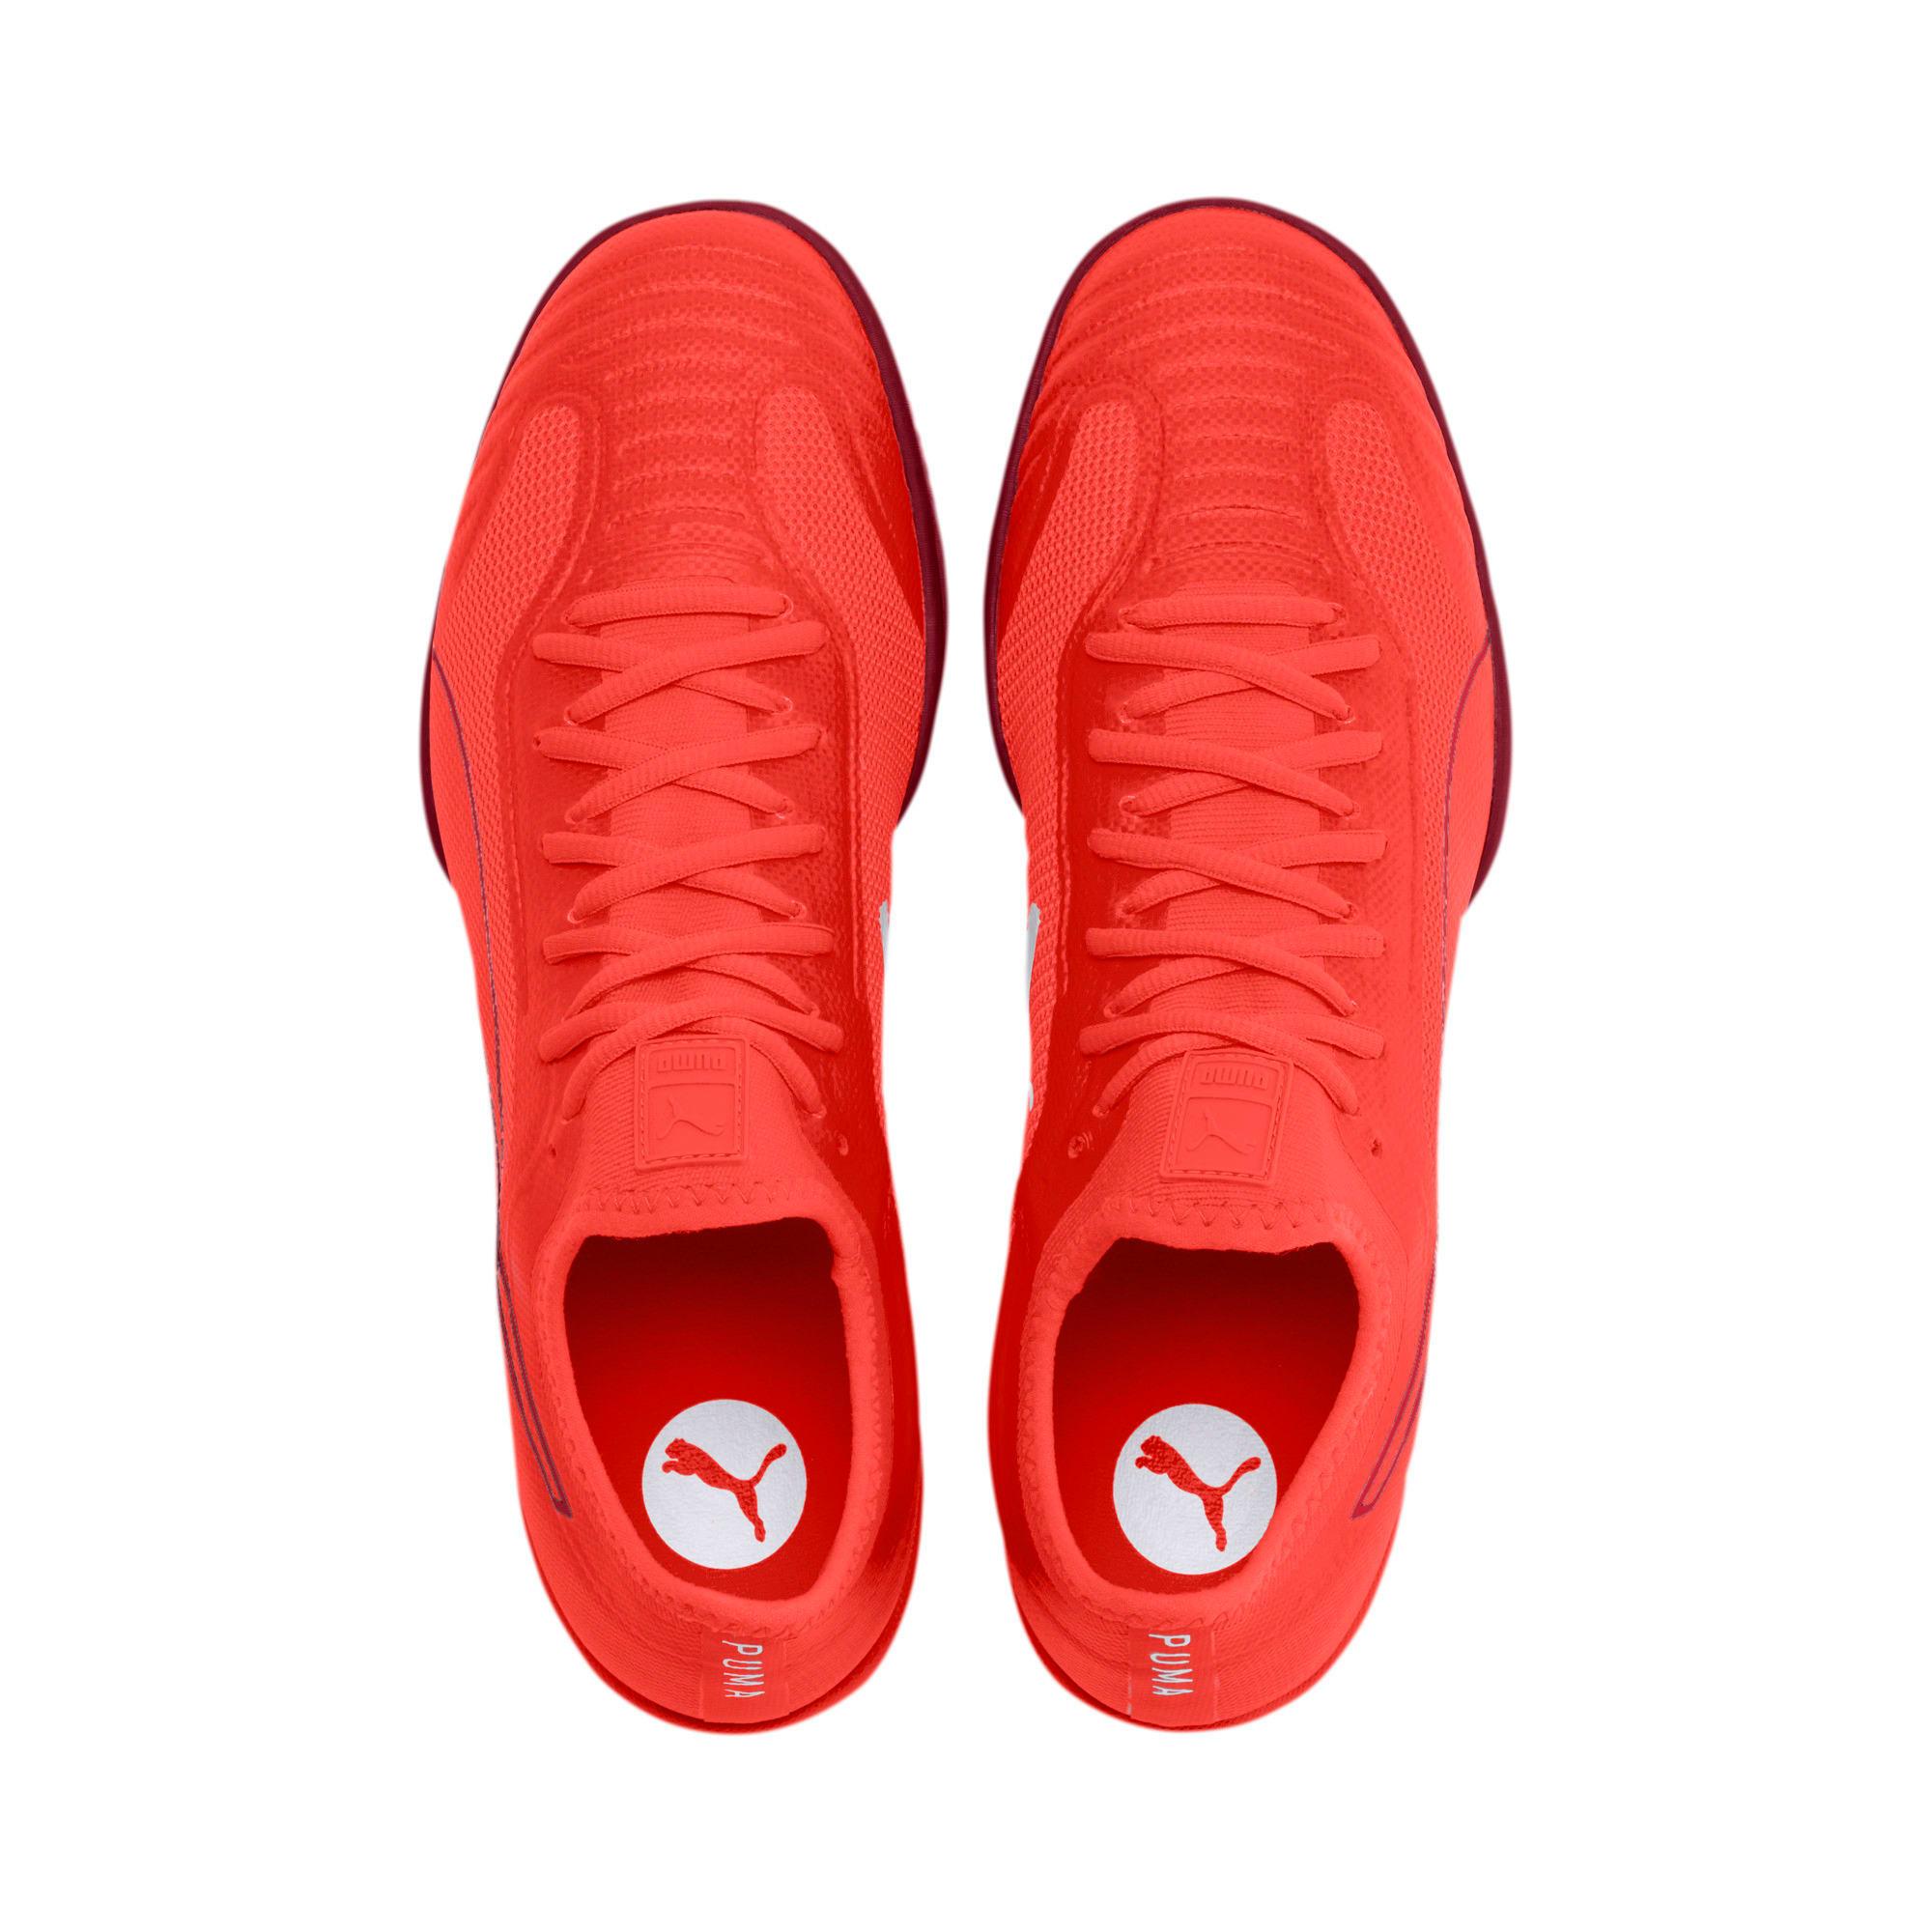 Thumbnail 7 of 365 Sala 1 Men's Soccer Shoes, Nrgy Red-Rhubarb, medium